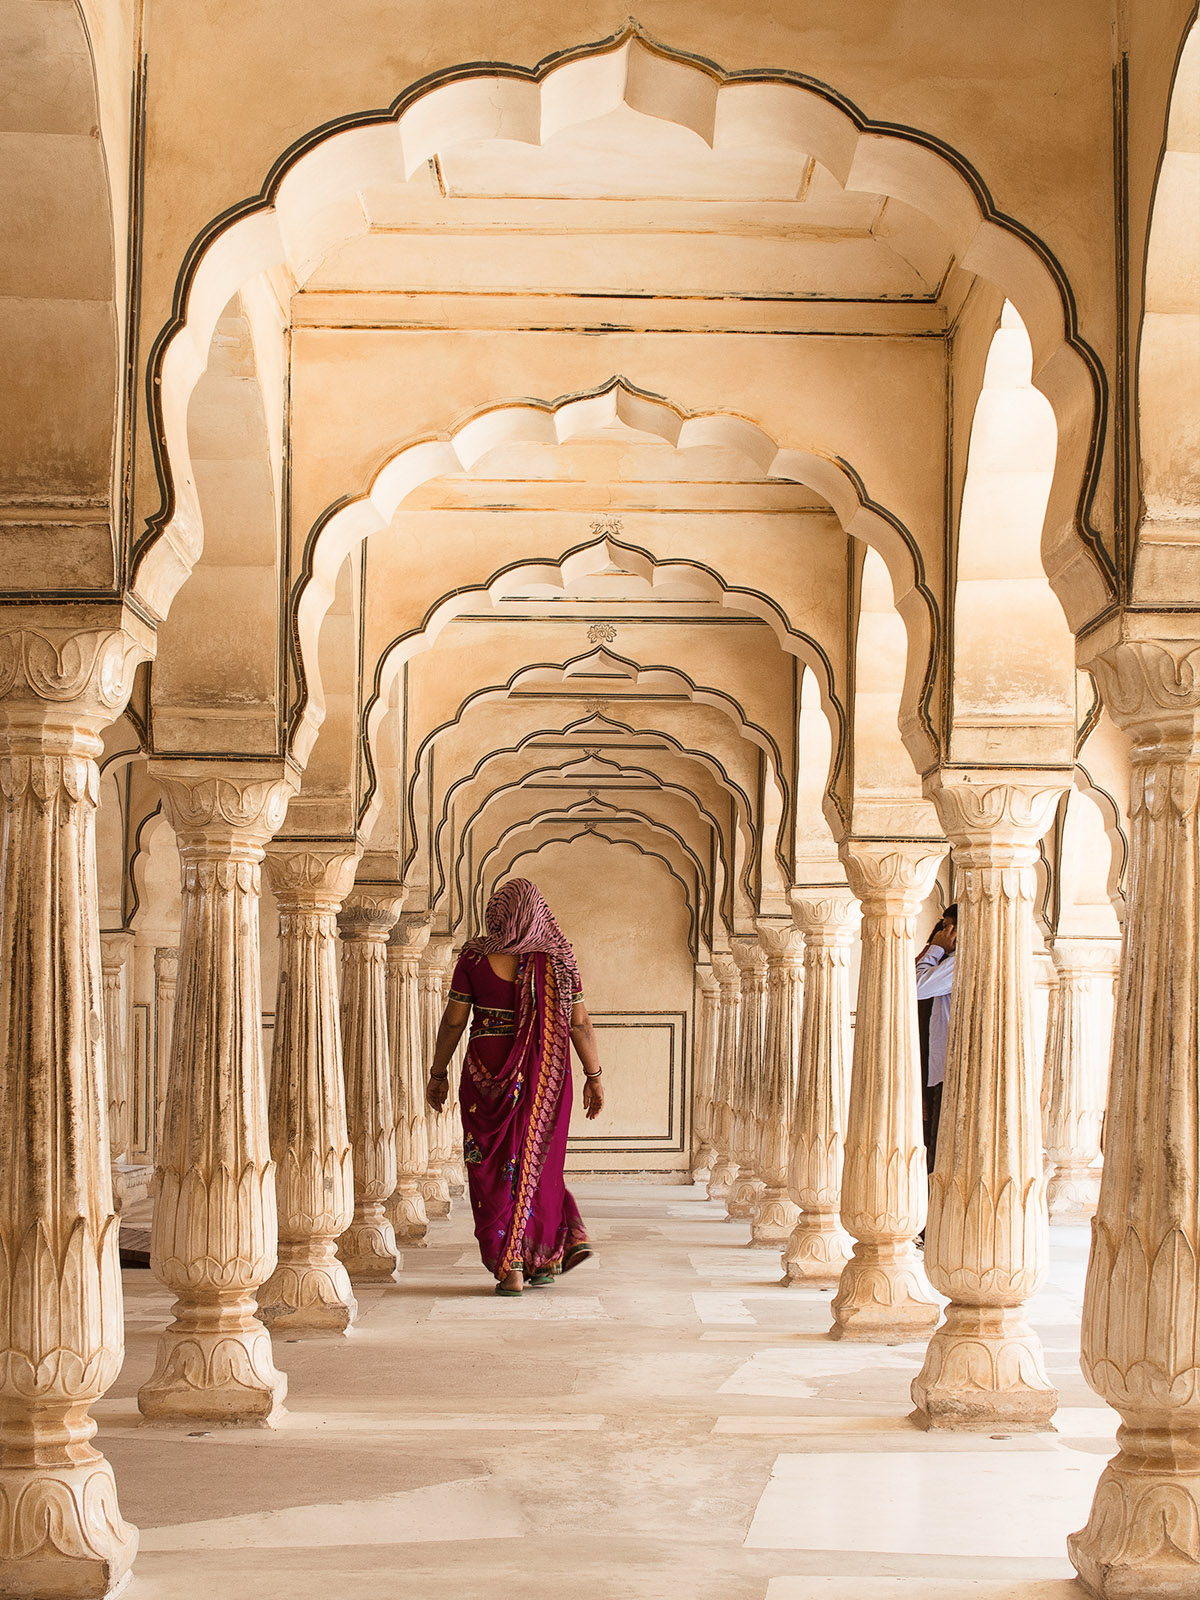 india_jaipur_amber_fort